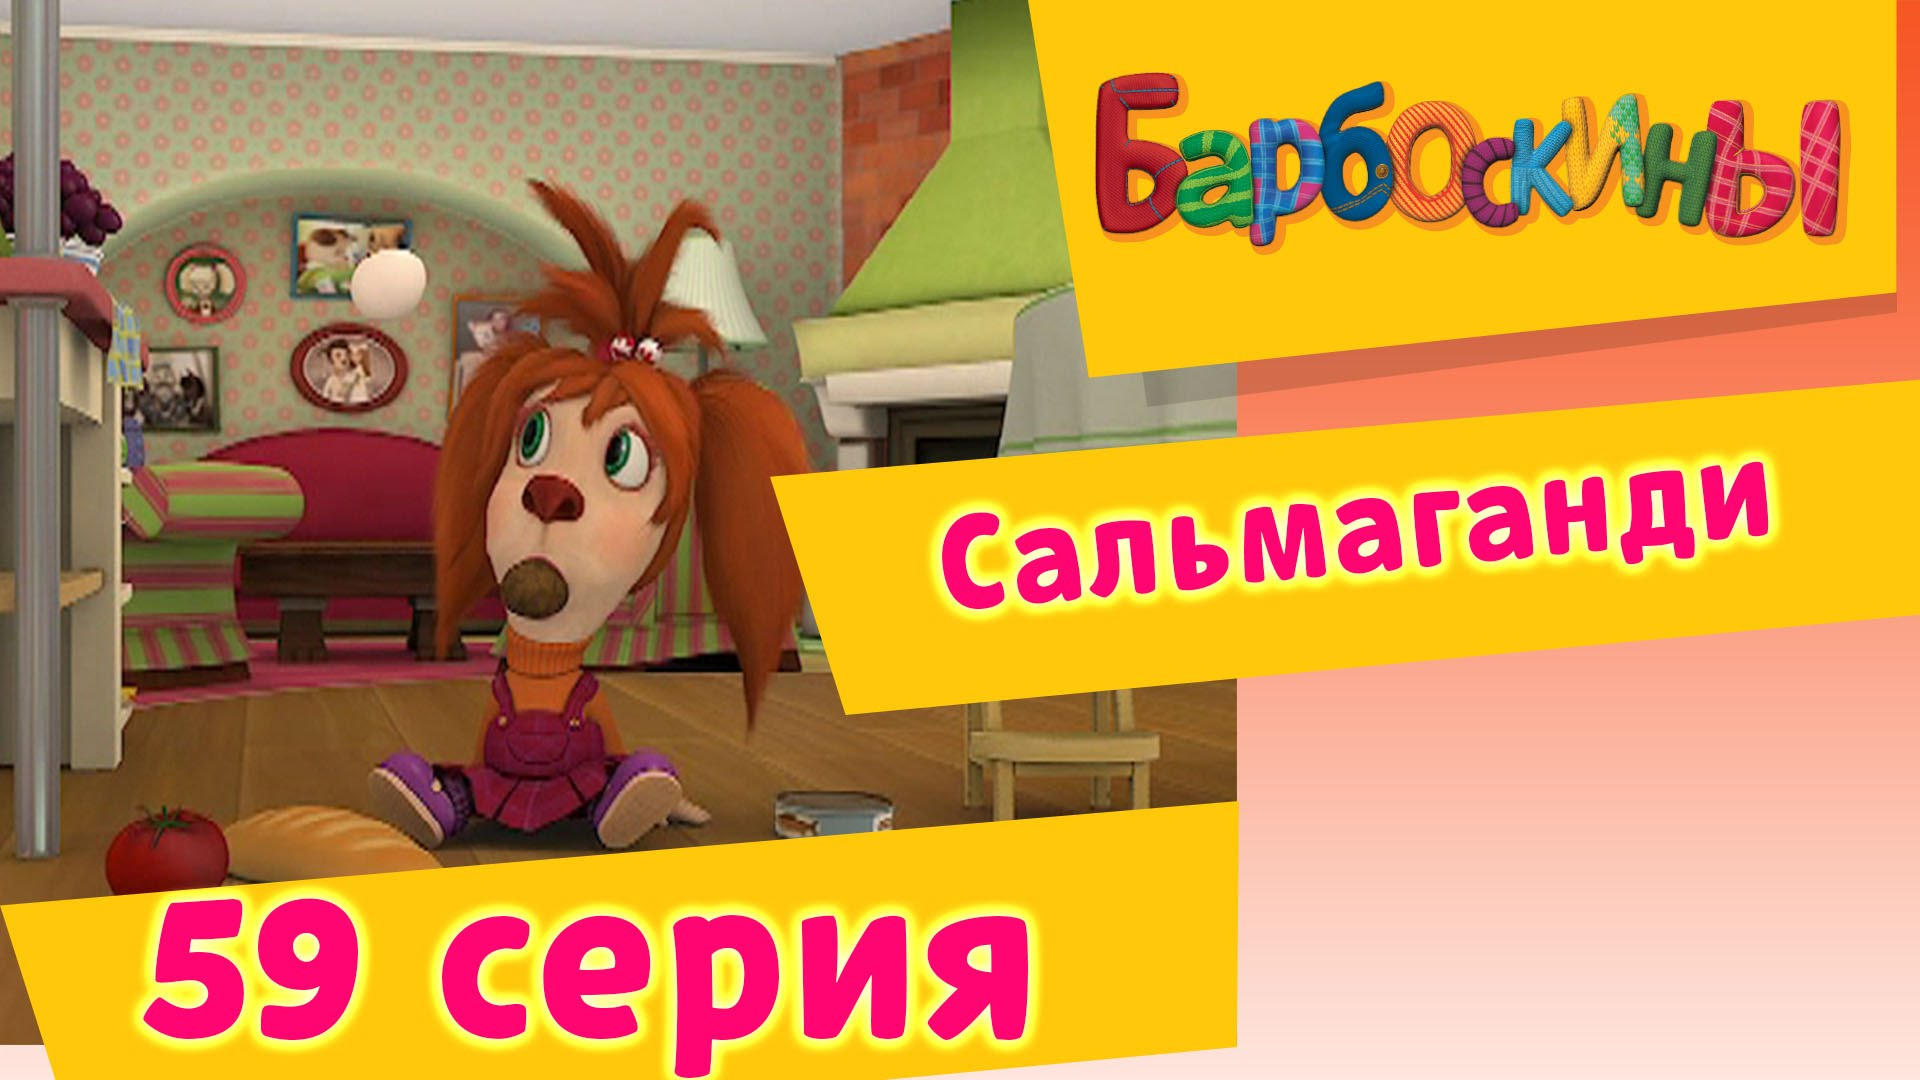 Барбоскины — 59 Серия. Сальмаганди